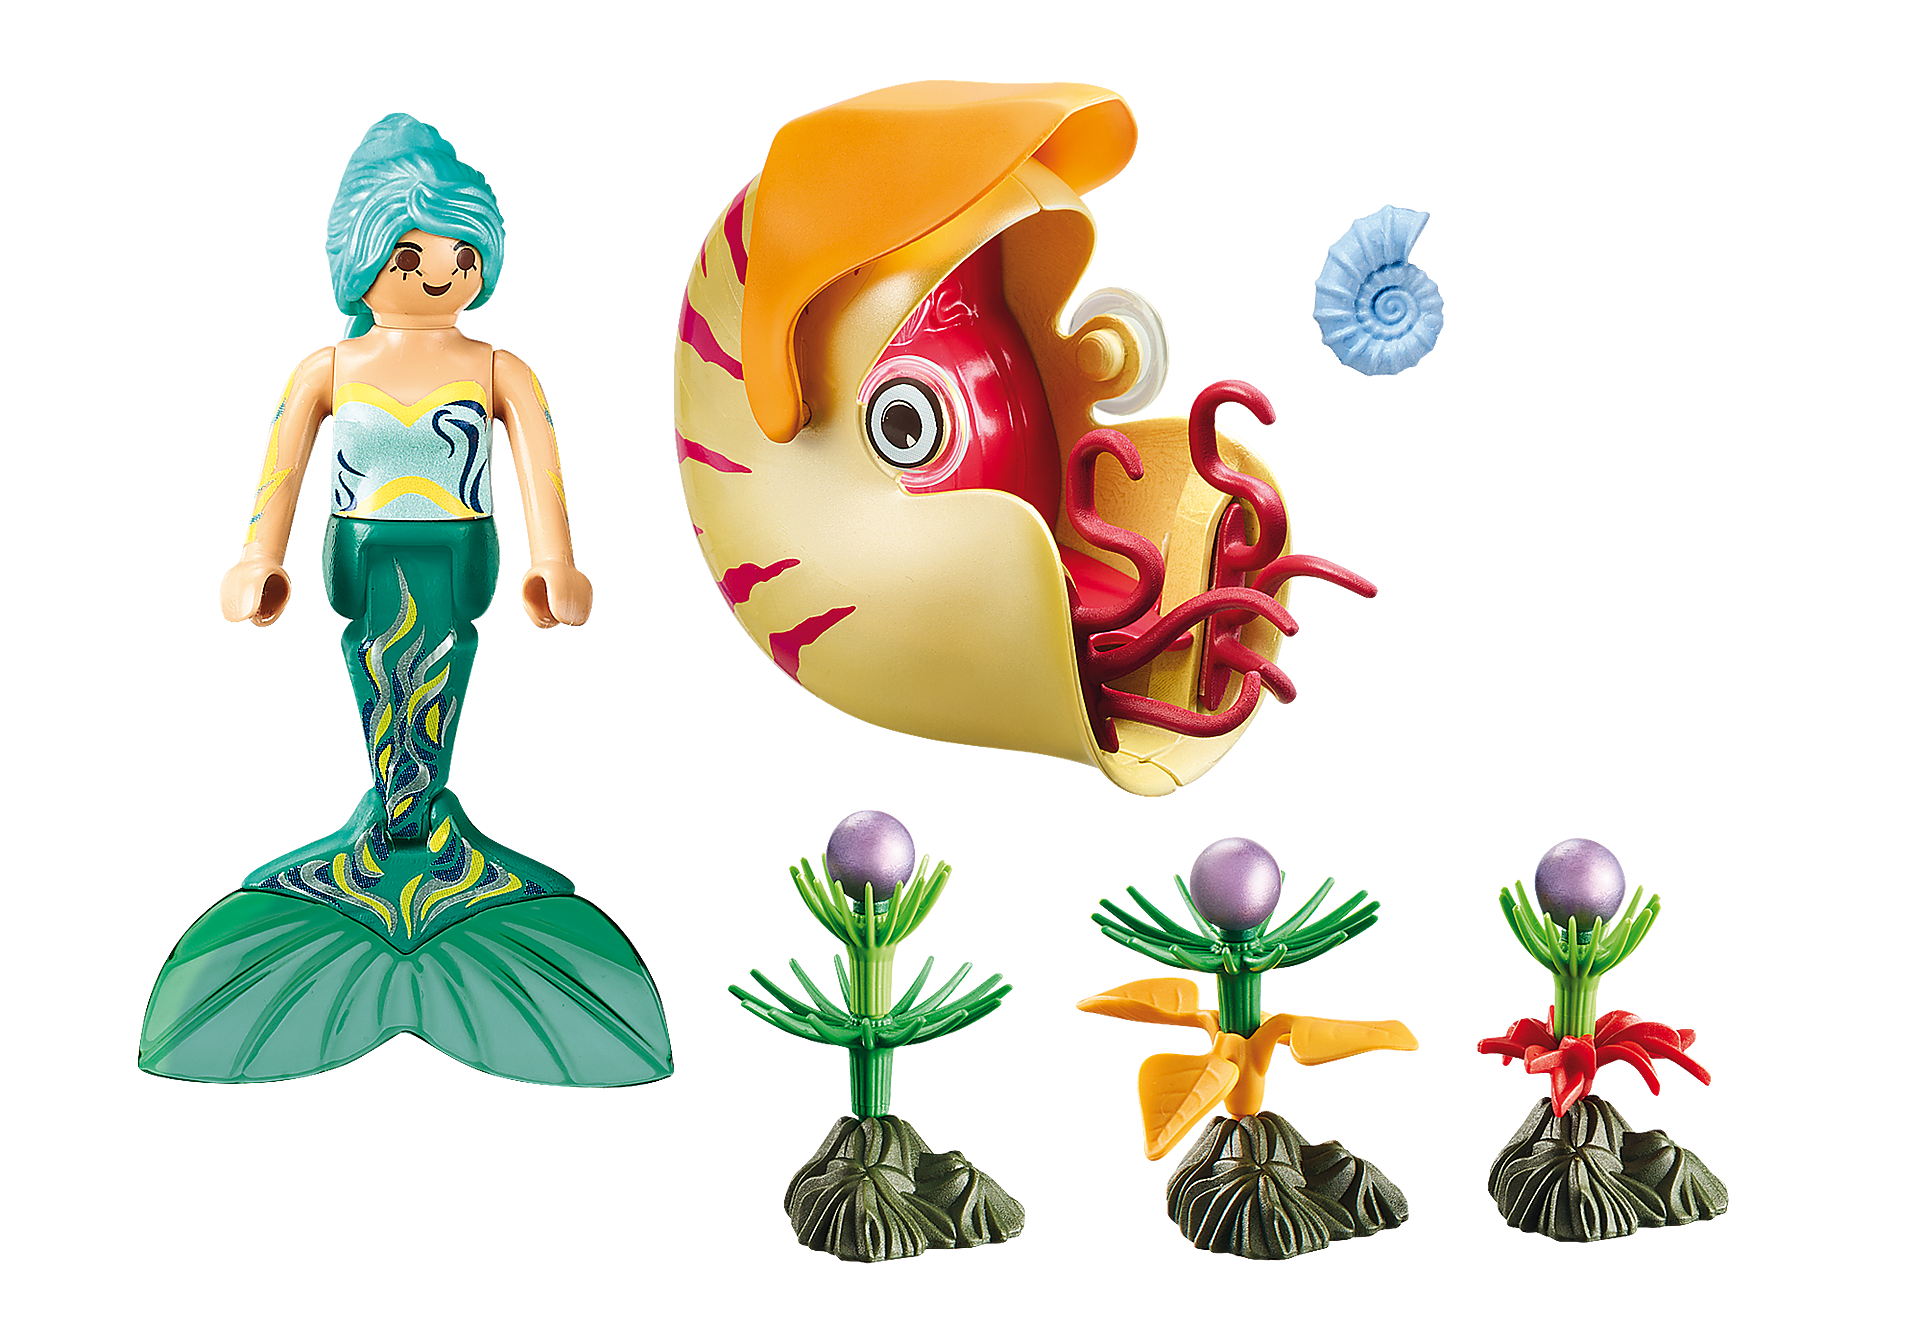 70098 Mermaid with Sea Snail Gondola zoom image3